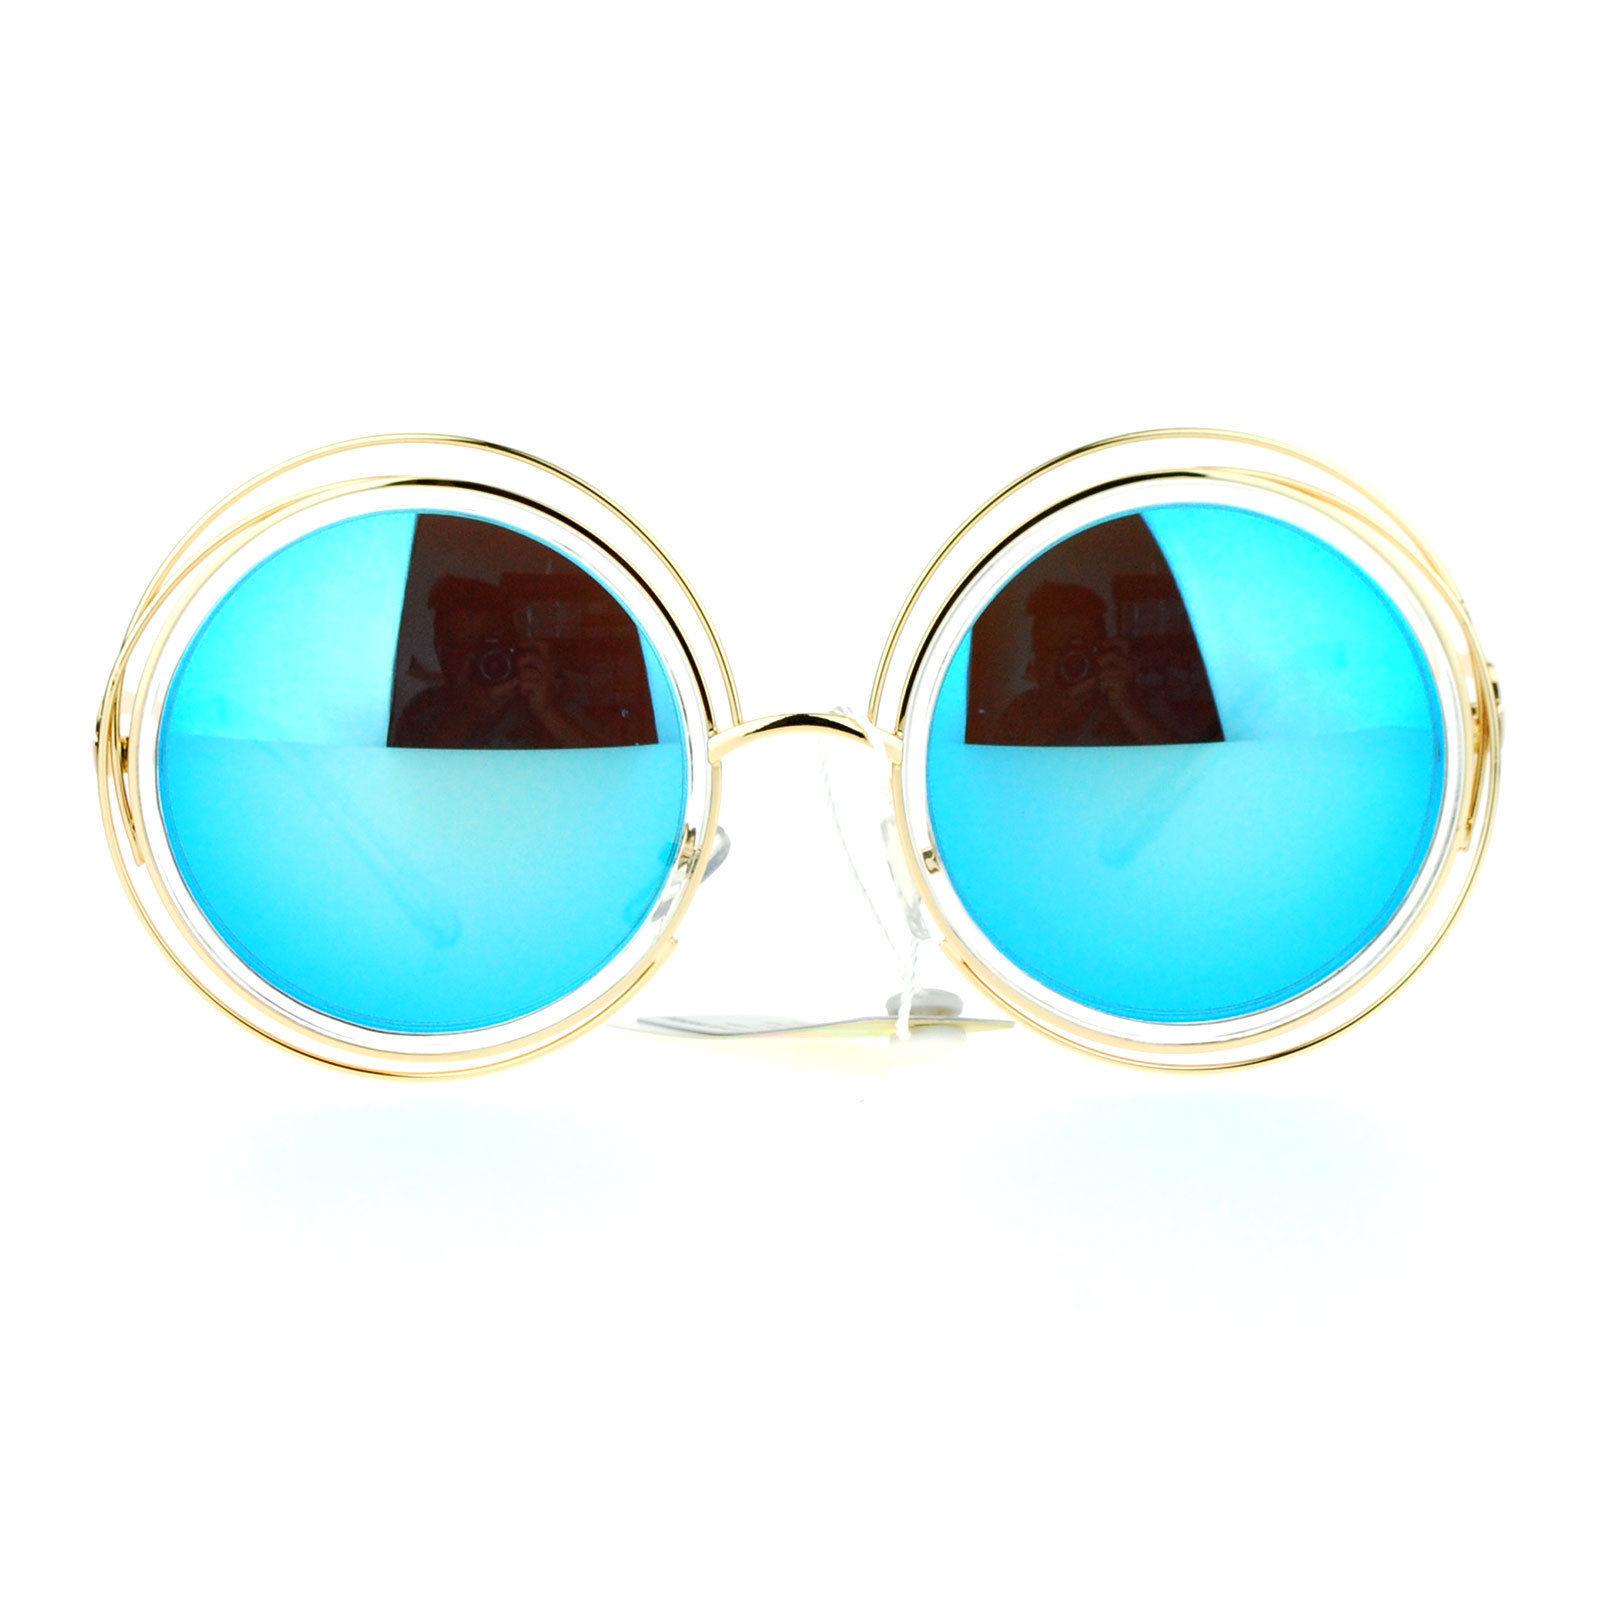 3b8dac87fea0 SA106 Double Scribble Frame Round Circle Mirrored Lens Retro Sunglasses